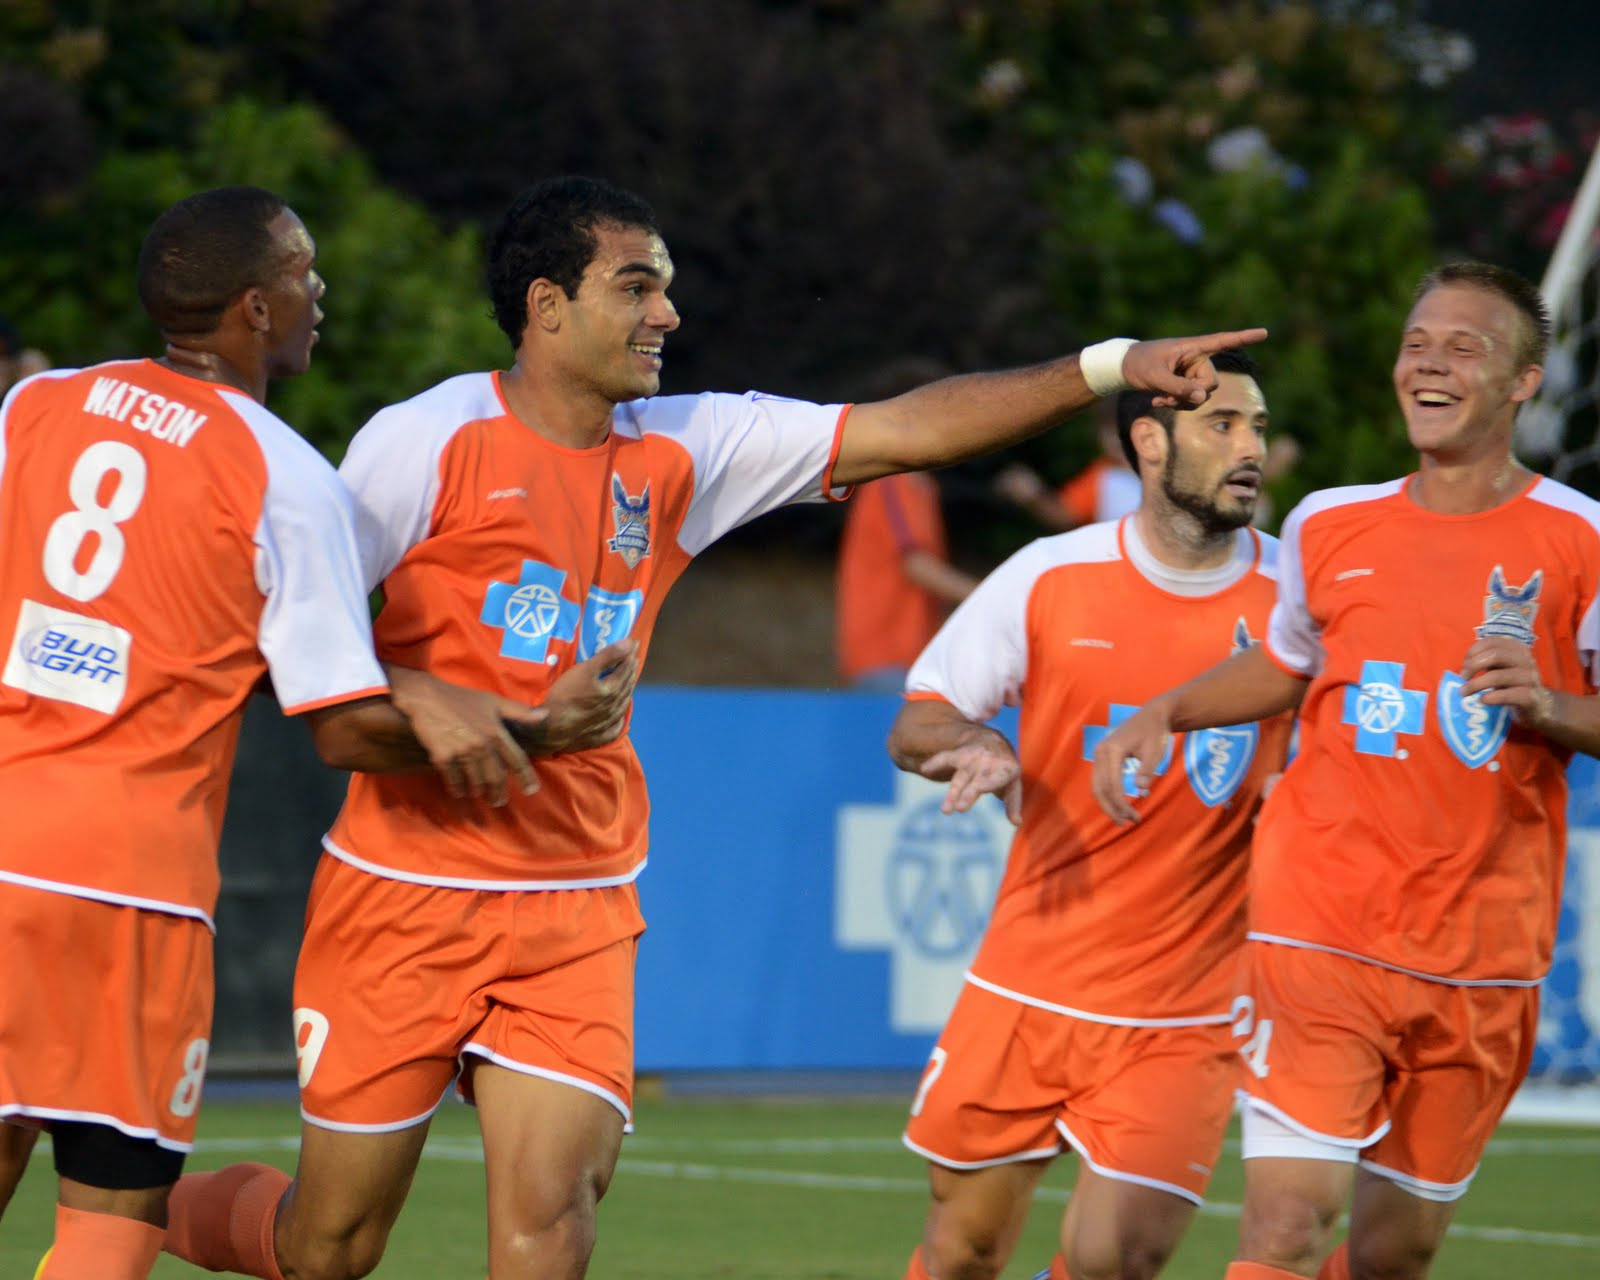 Requiem for an American Soccer Club